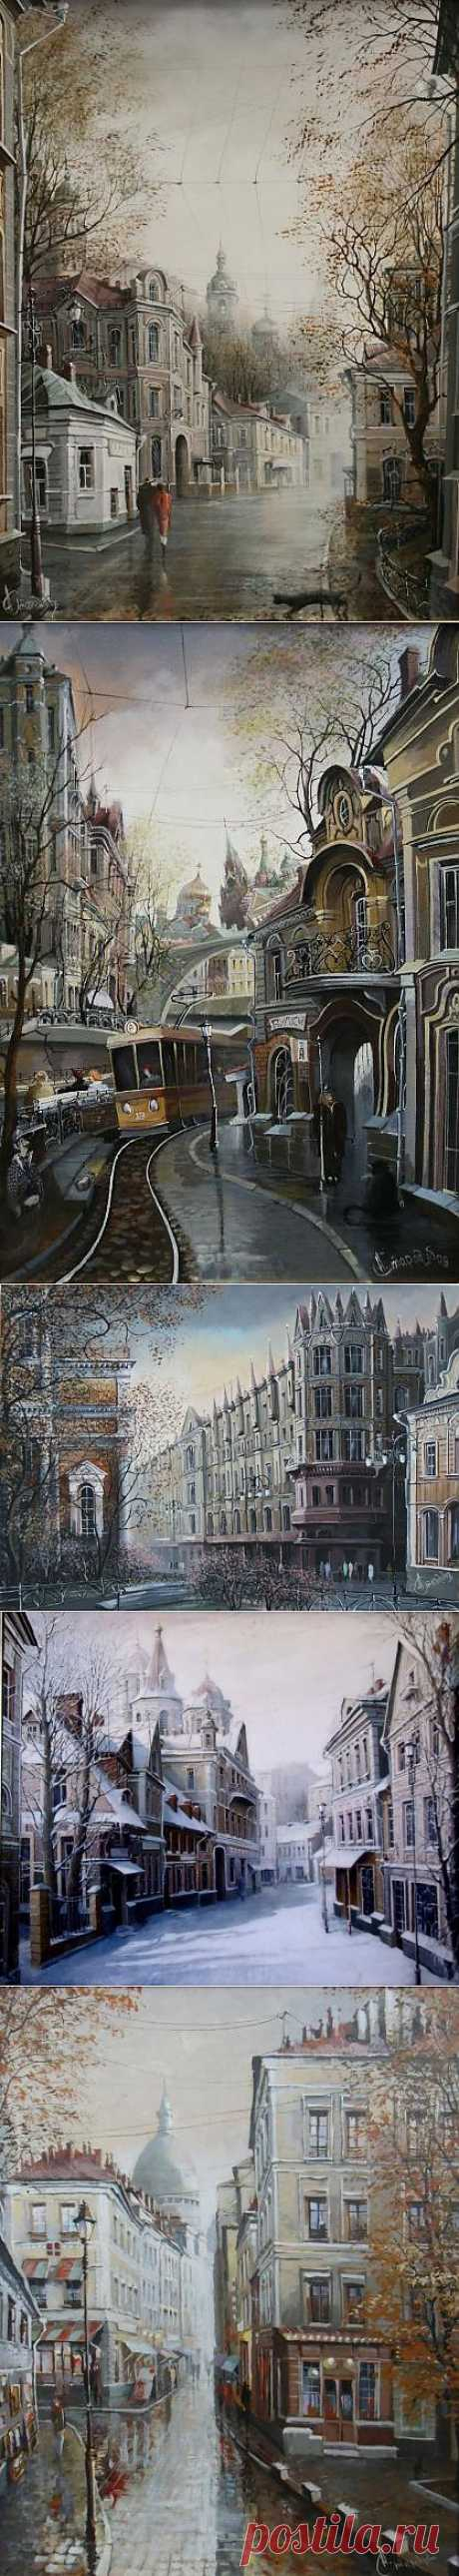 (+1) - Старая Москва в картинах Александра Стародубова | Искусство